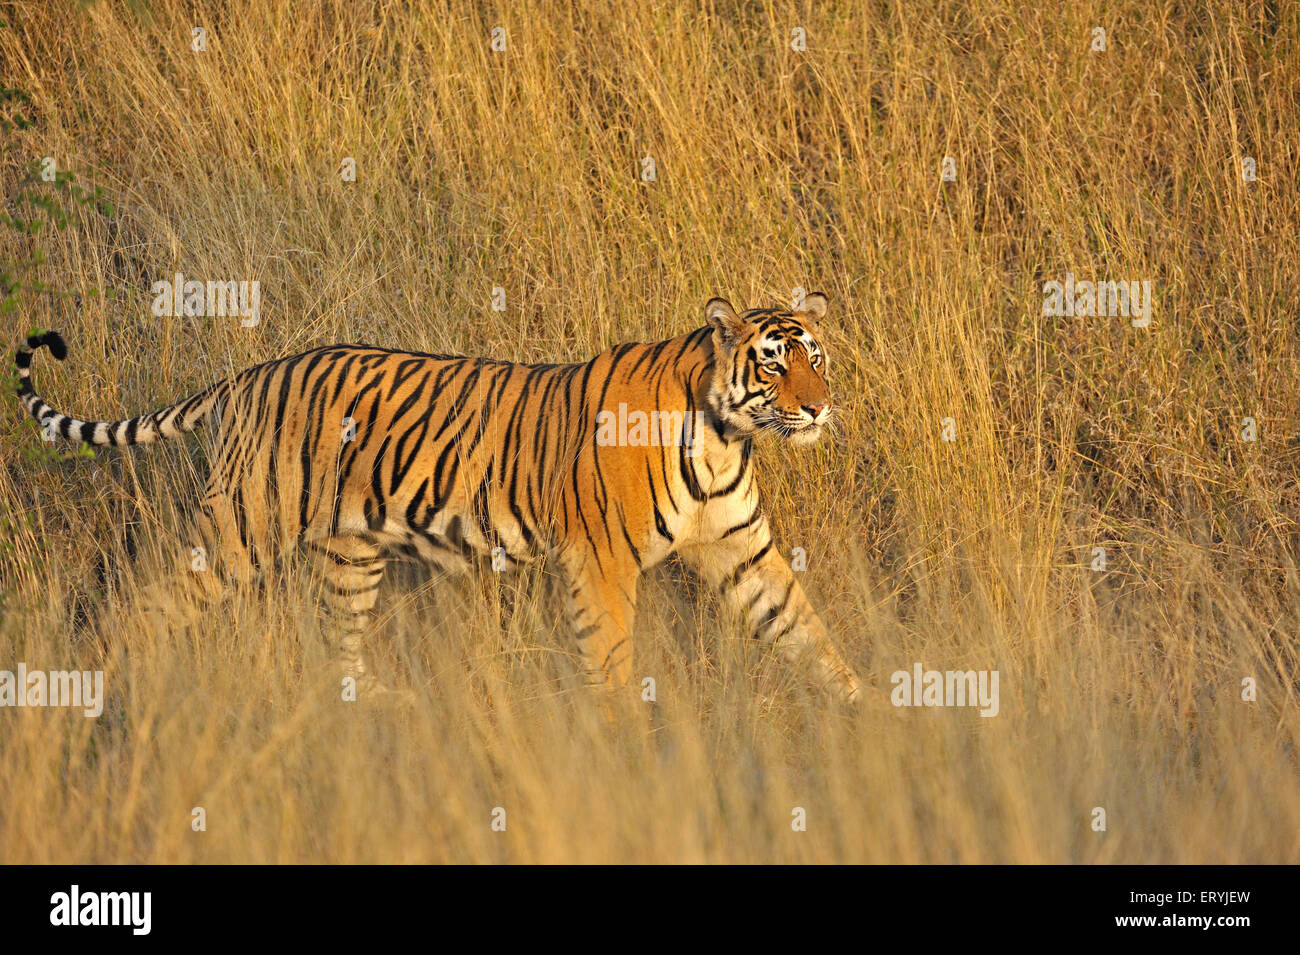 Tiger panthera tigris tigris moving in dry grasses ; Ranthambore national park ; Rajasthan ; India - Stock Image